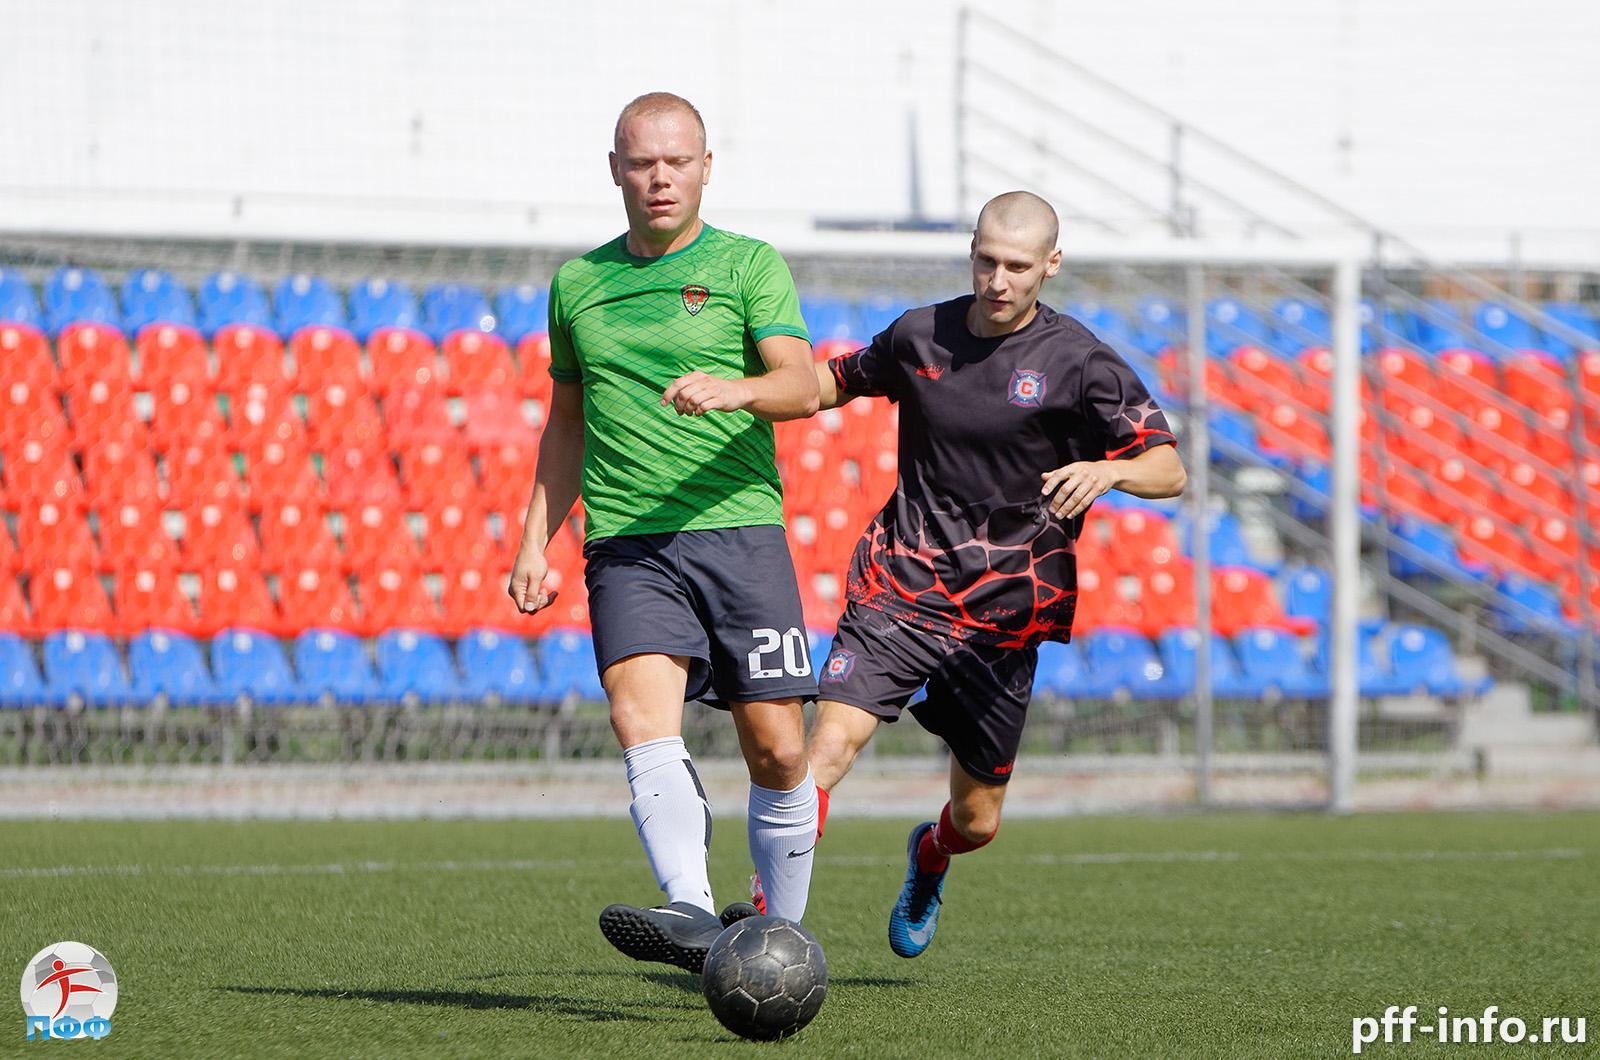 Премьер-лига ТДК. 16 тур. Матч тура